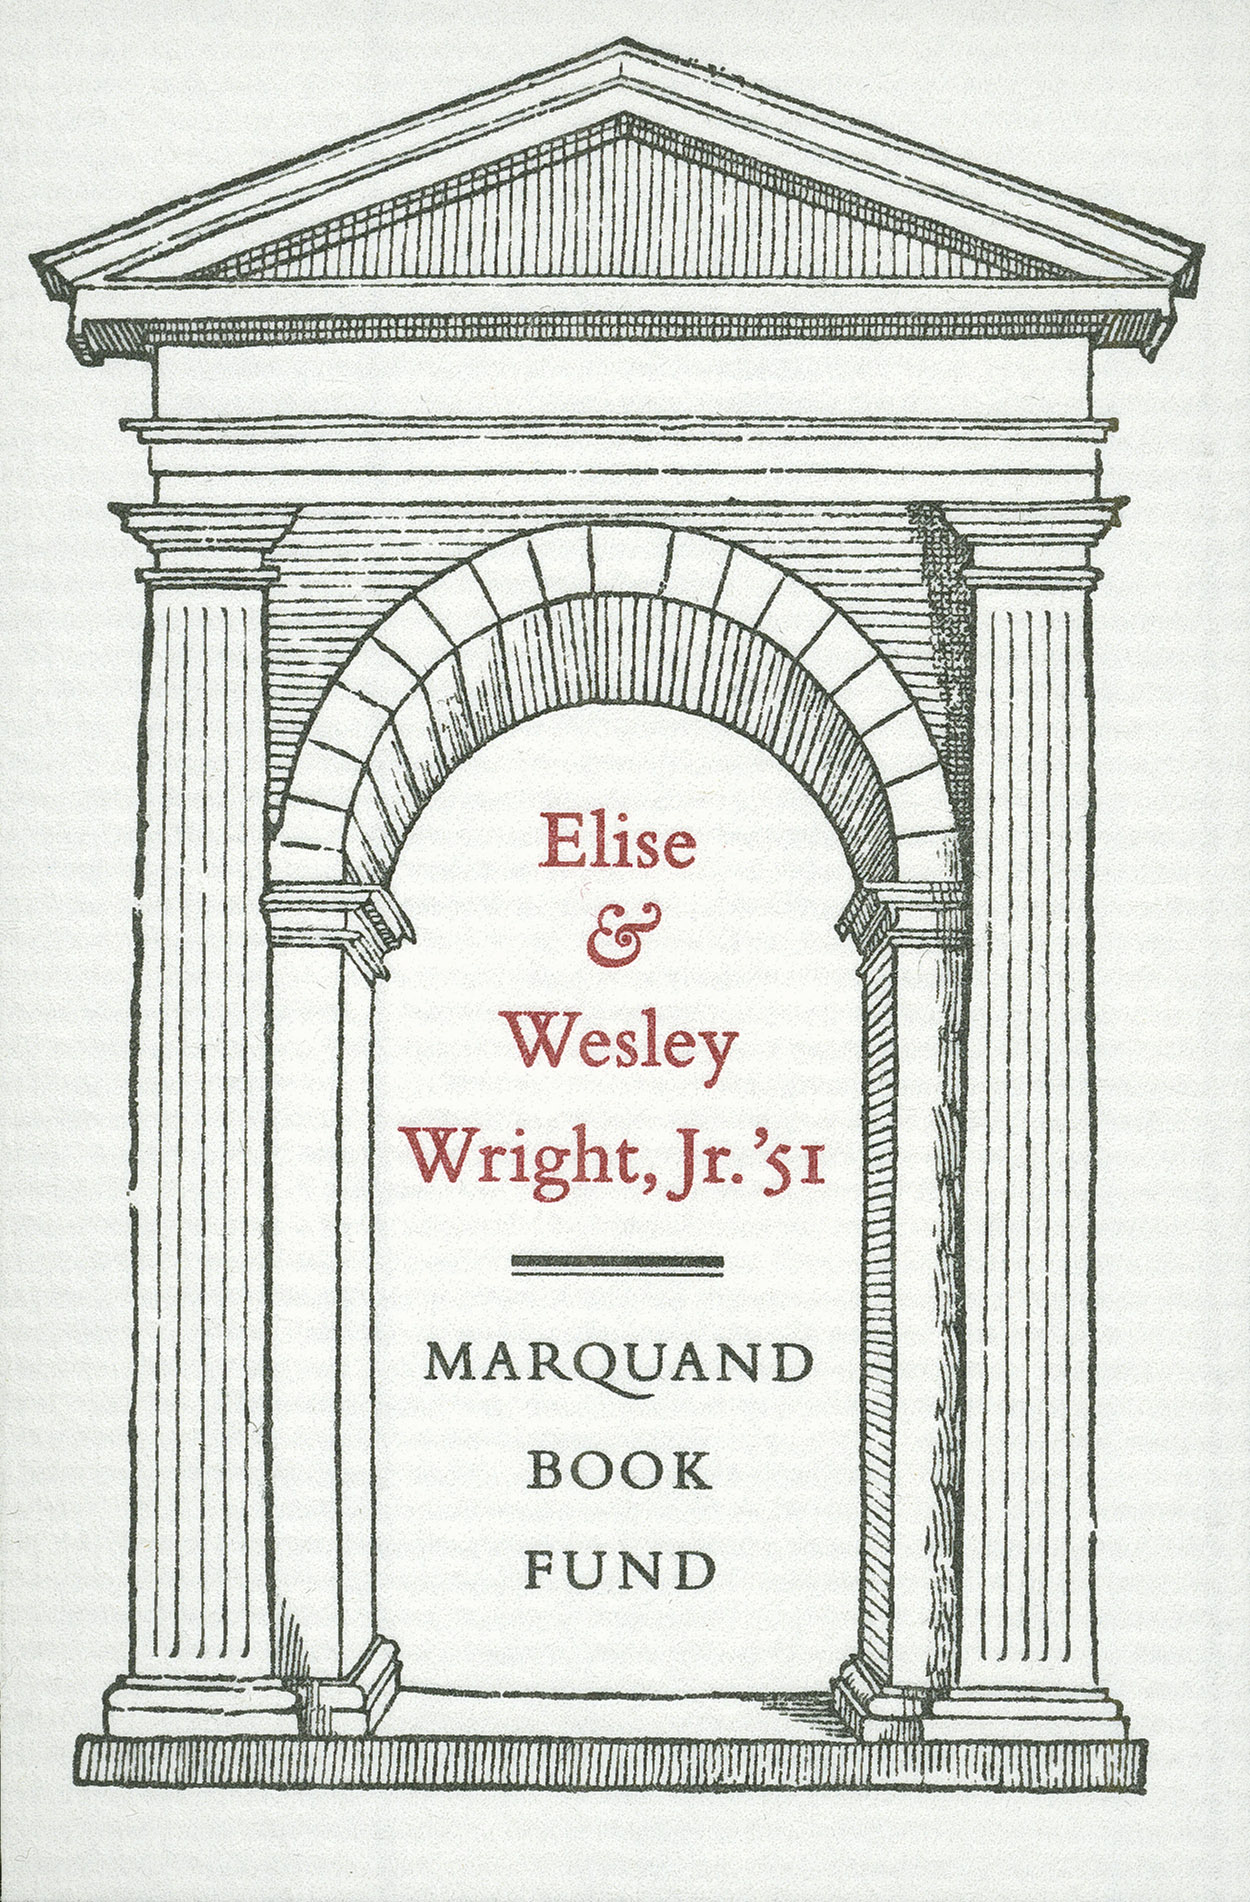 Marquand bookplate.jpg